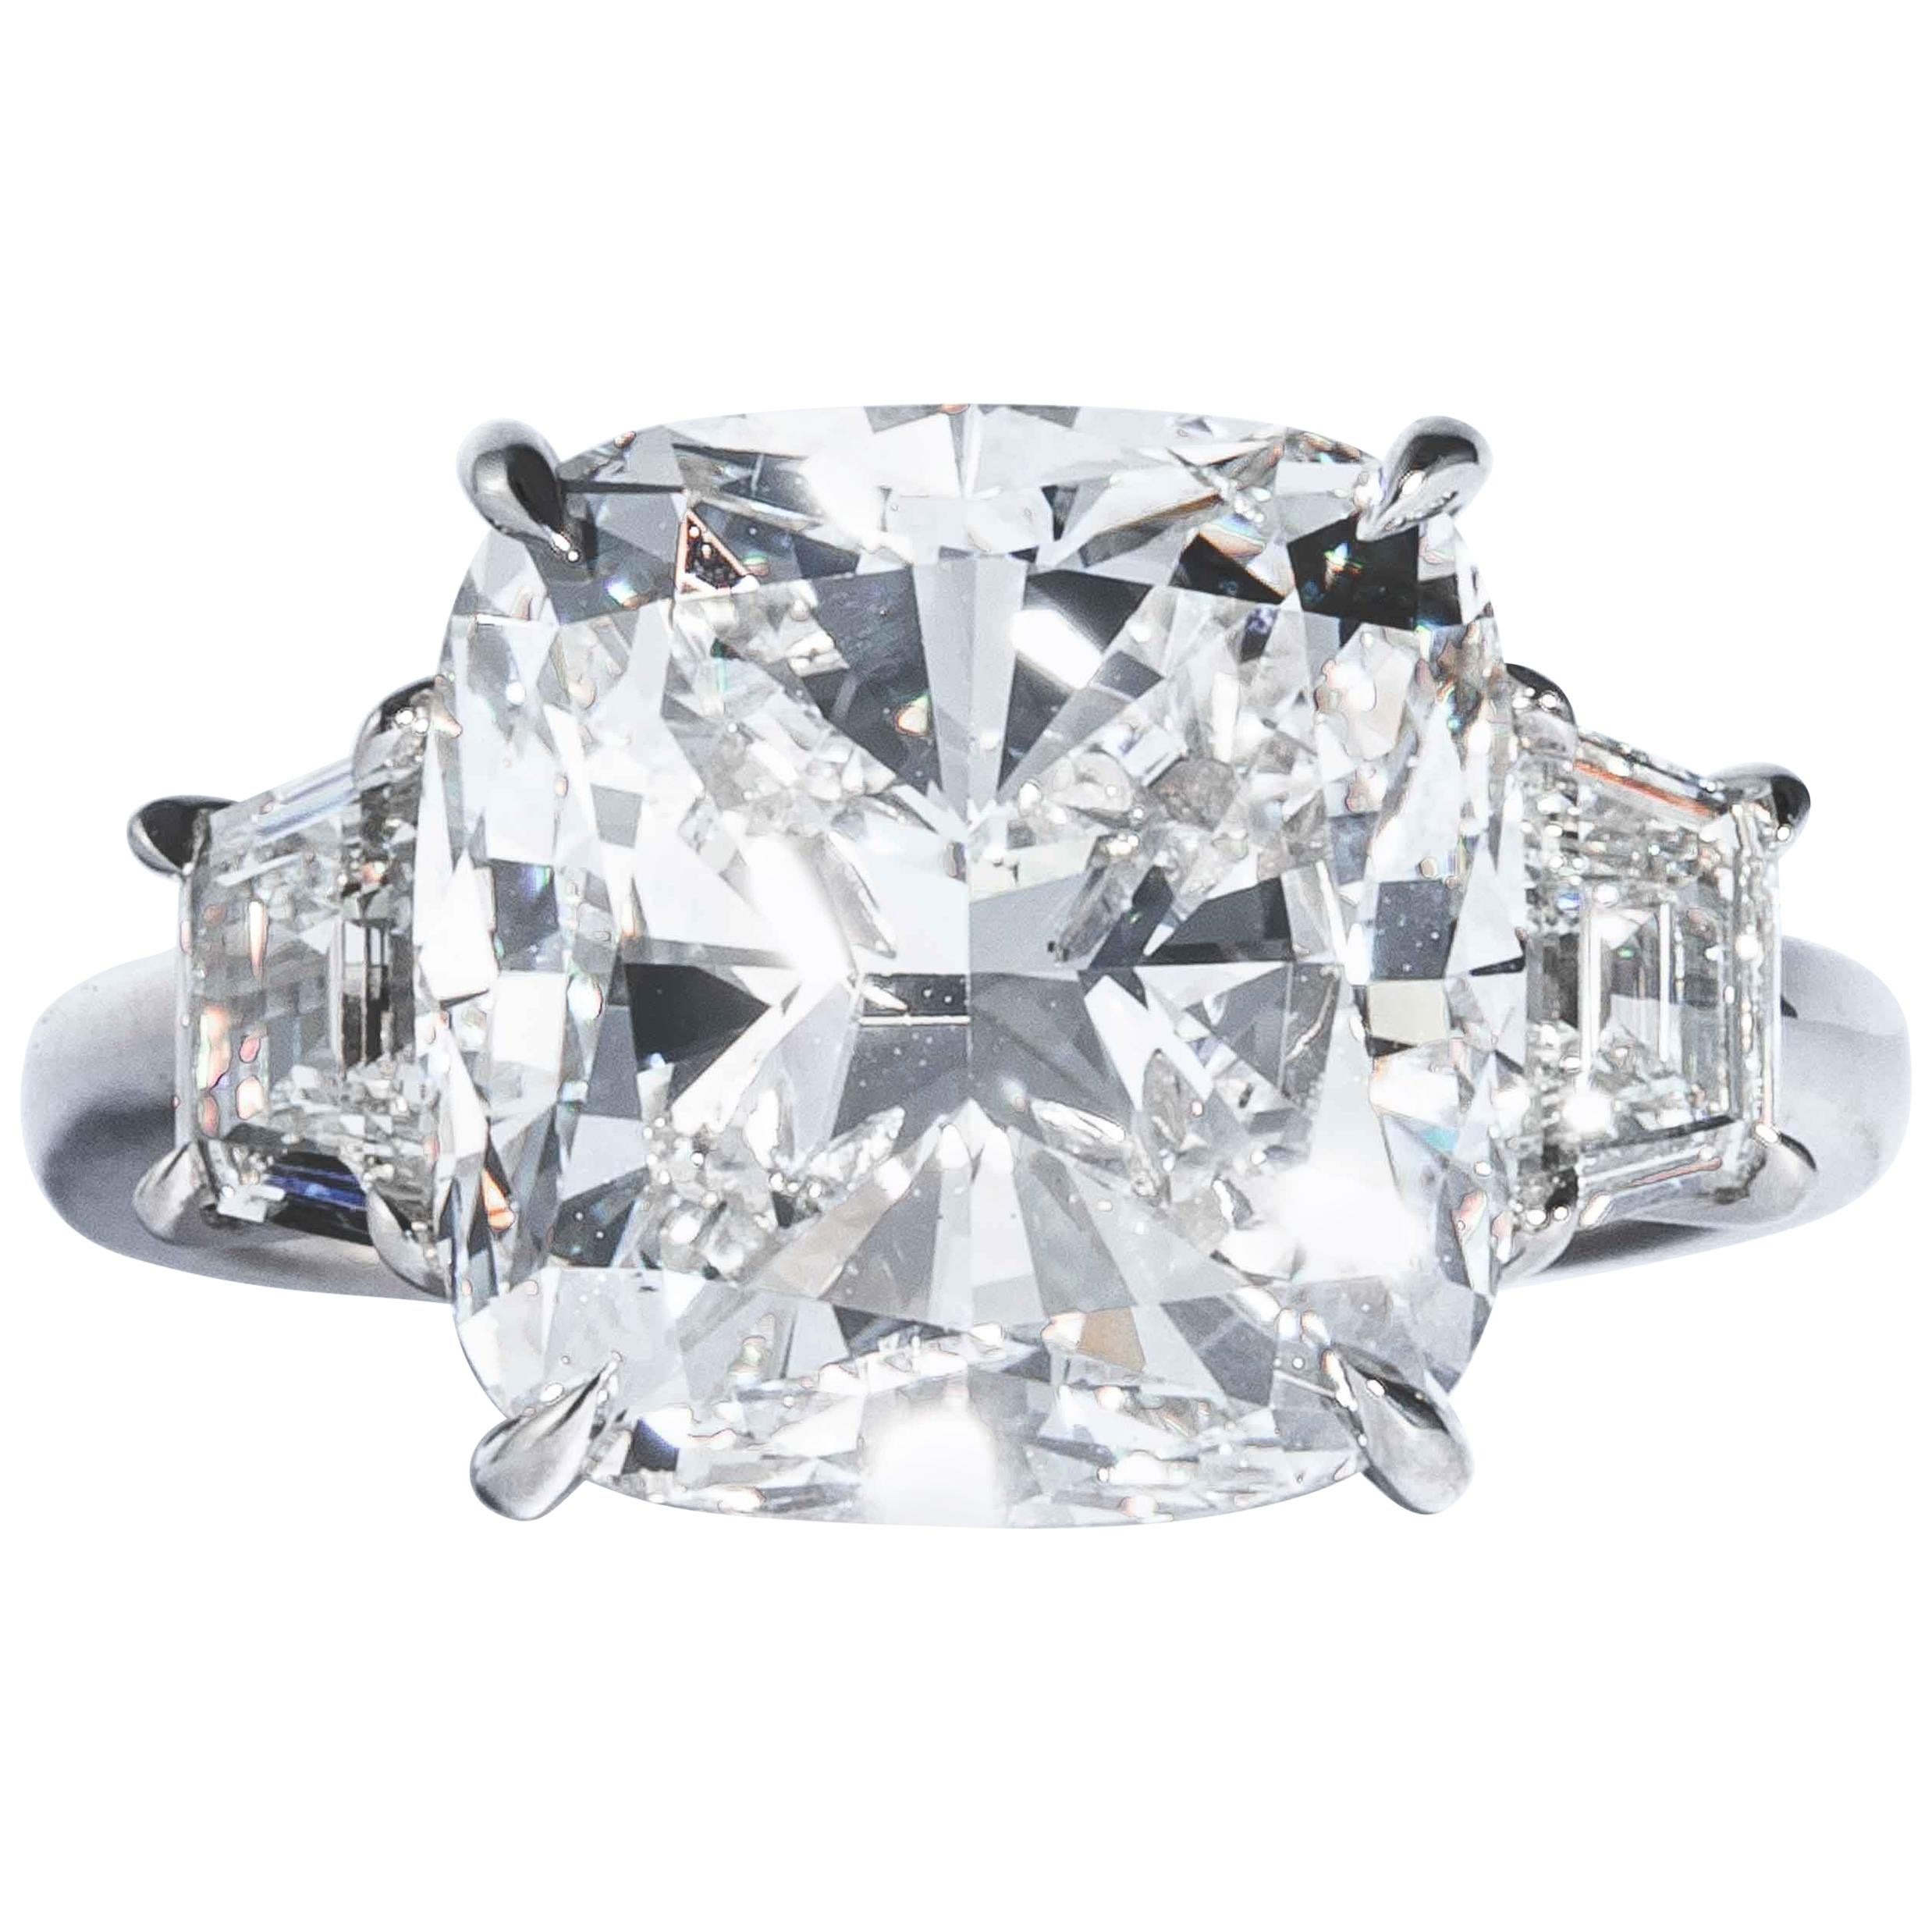 Shreve, Crump & Low GIA Certified 10.01 Carat G SI1 Cushion Cut Diamond Ring